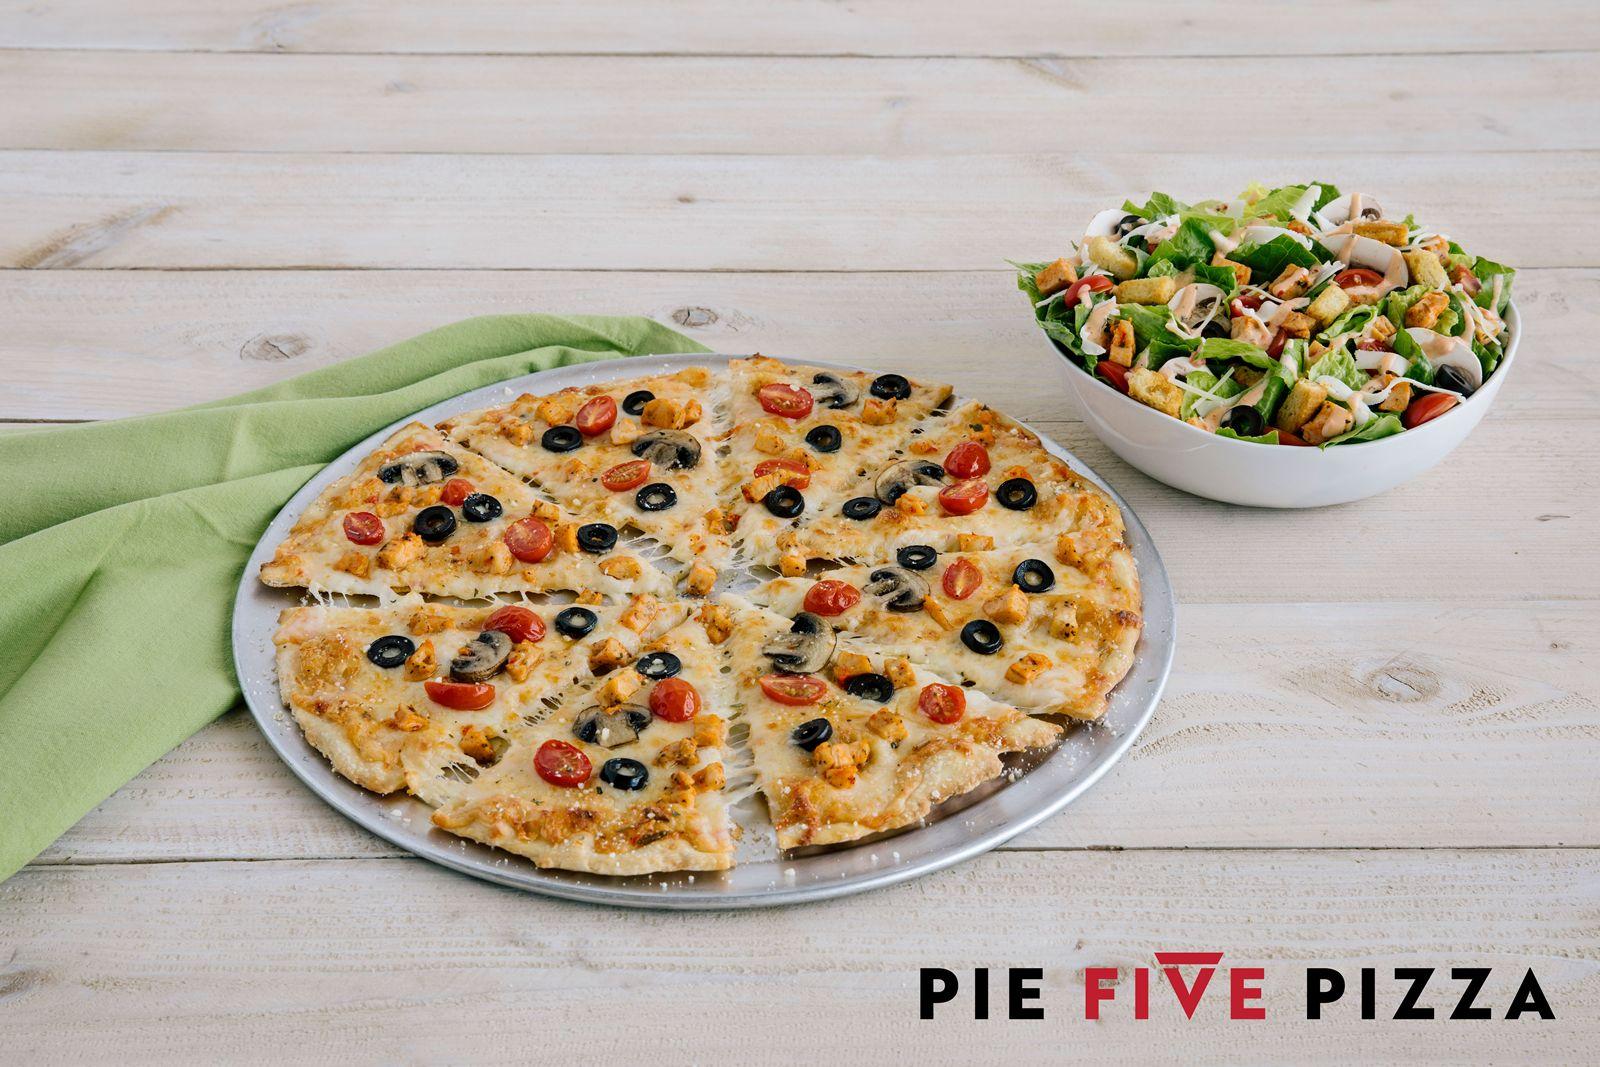 Next Stop on Pie Five's Pizza Passport Sweepstakes: Italian Chicken